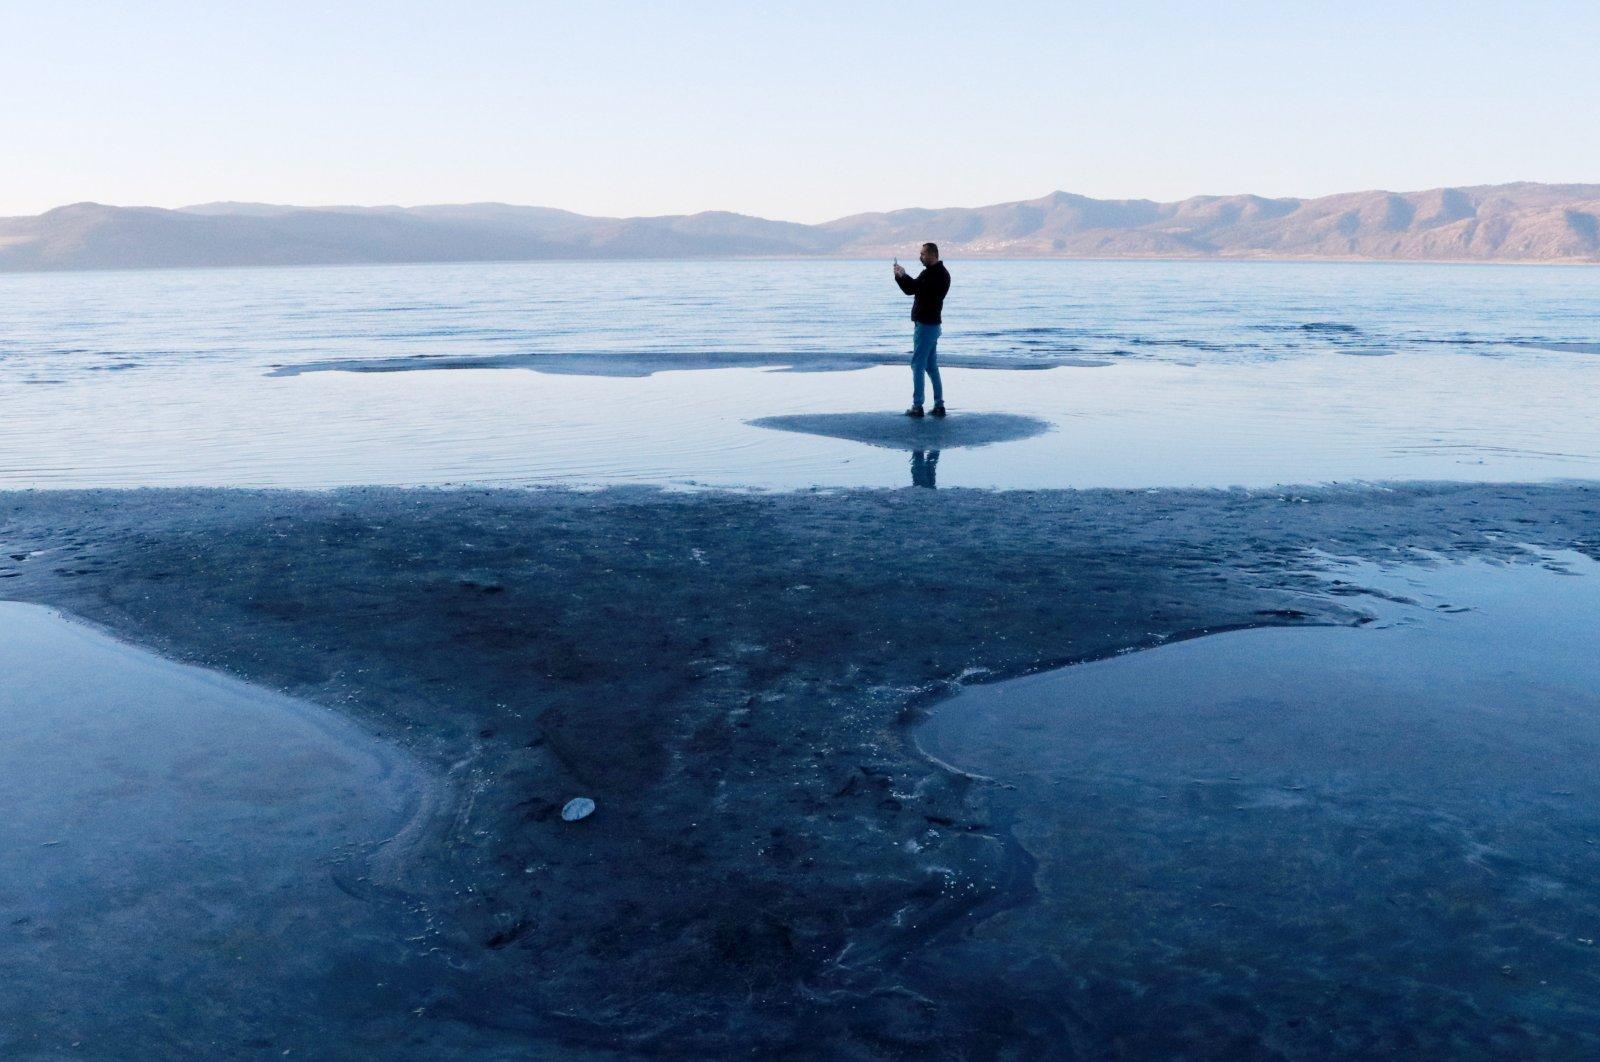 A man stands on an islet at Lake Salda, in Burdur, southwestern Turkey, Feb. 18, 2021. (DHA Photo)